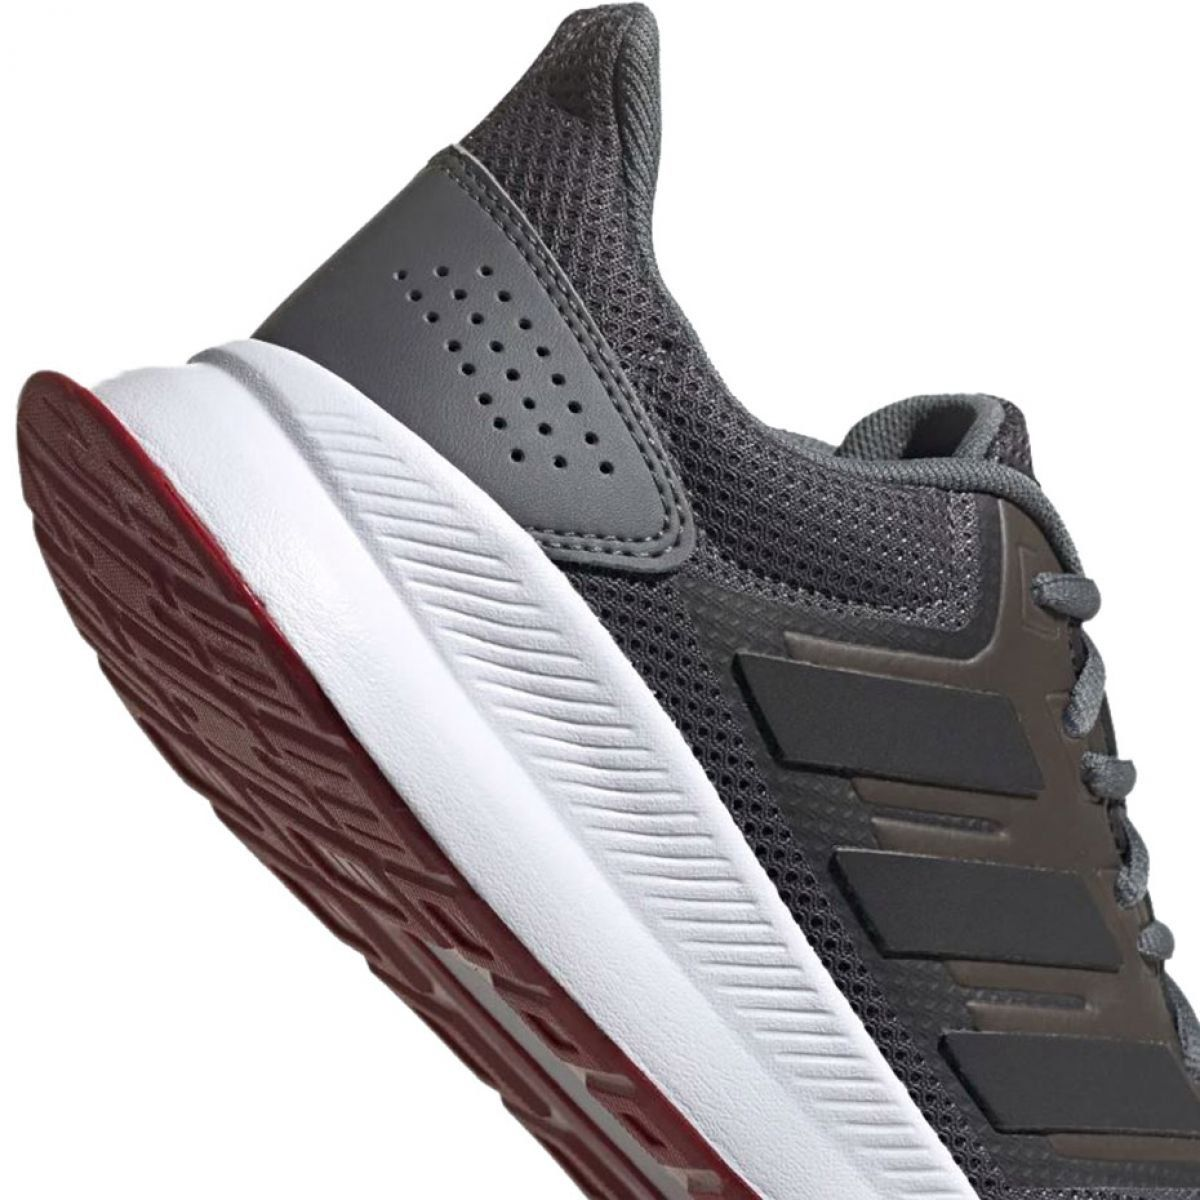 Buty Biegowe Adidas Runfalcon M Ee8153 Szare Adidas Sneakers Shoes Sneakers